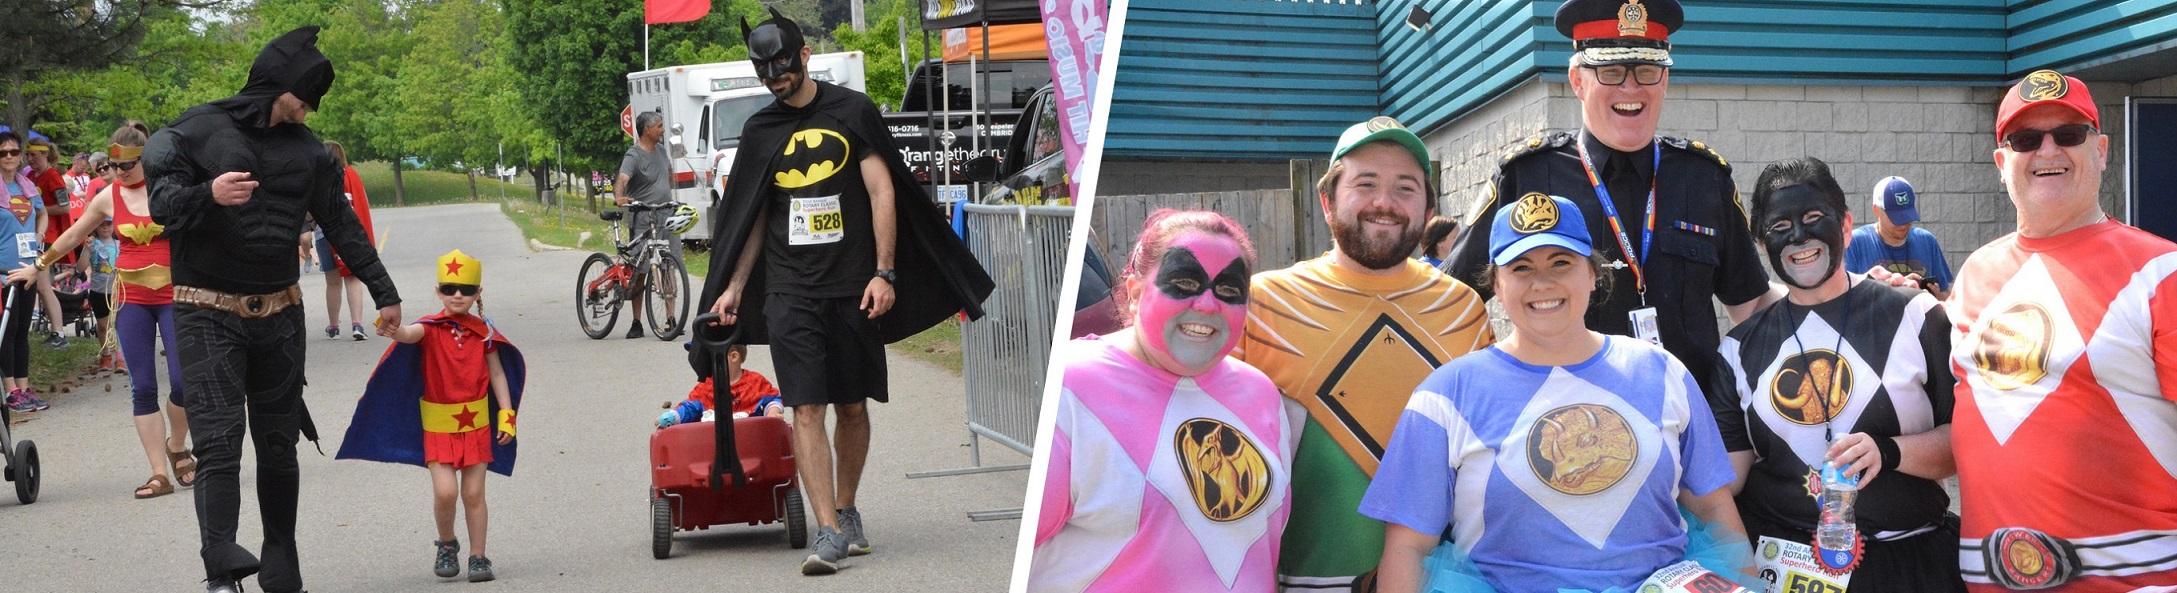 Fun times in costume at the Rotary Classic Superhero Run.